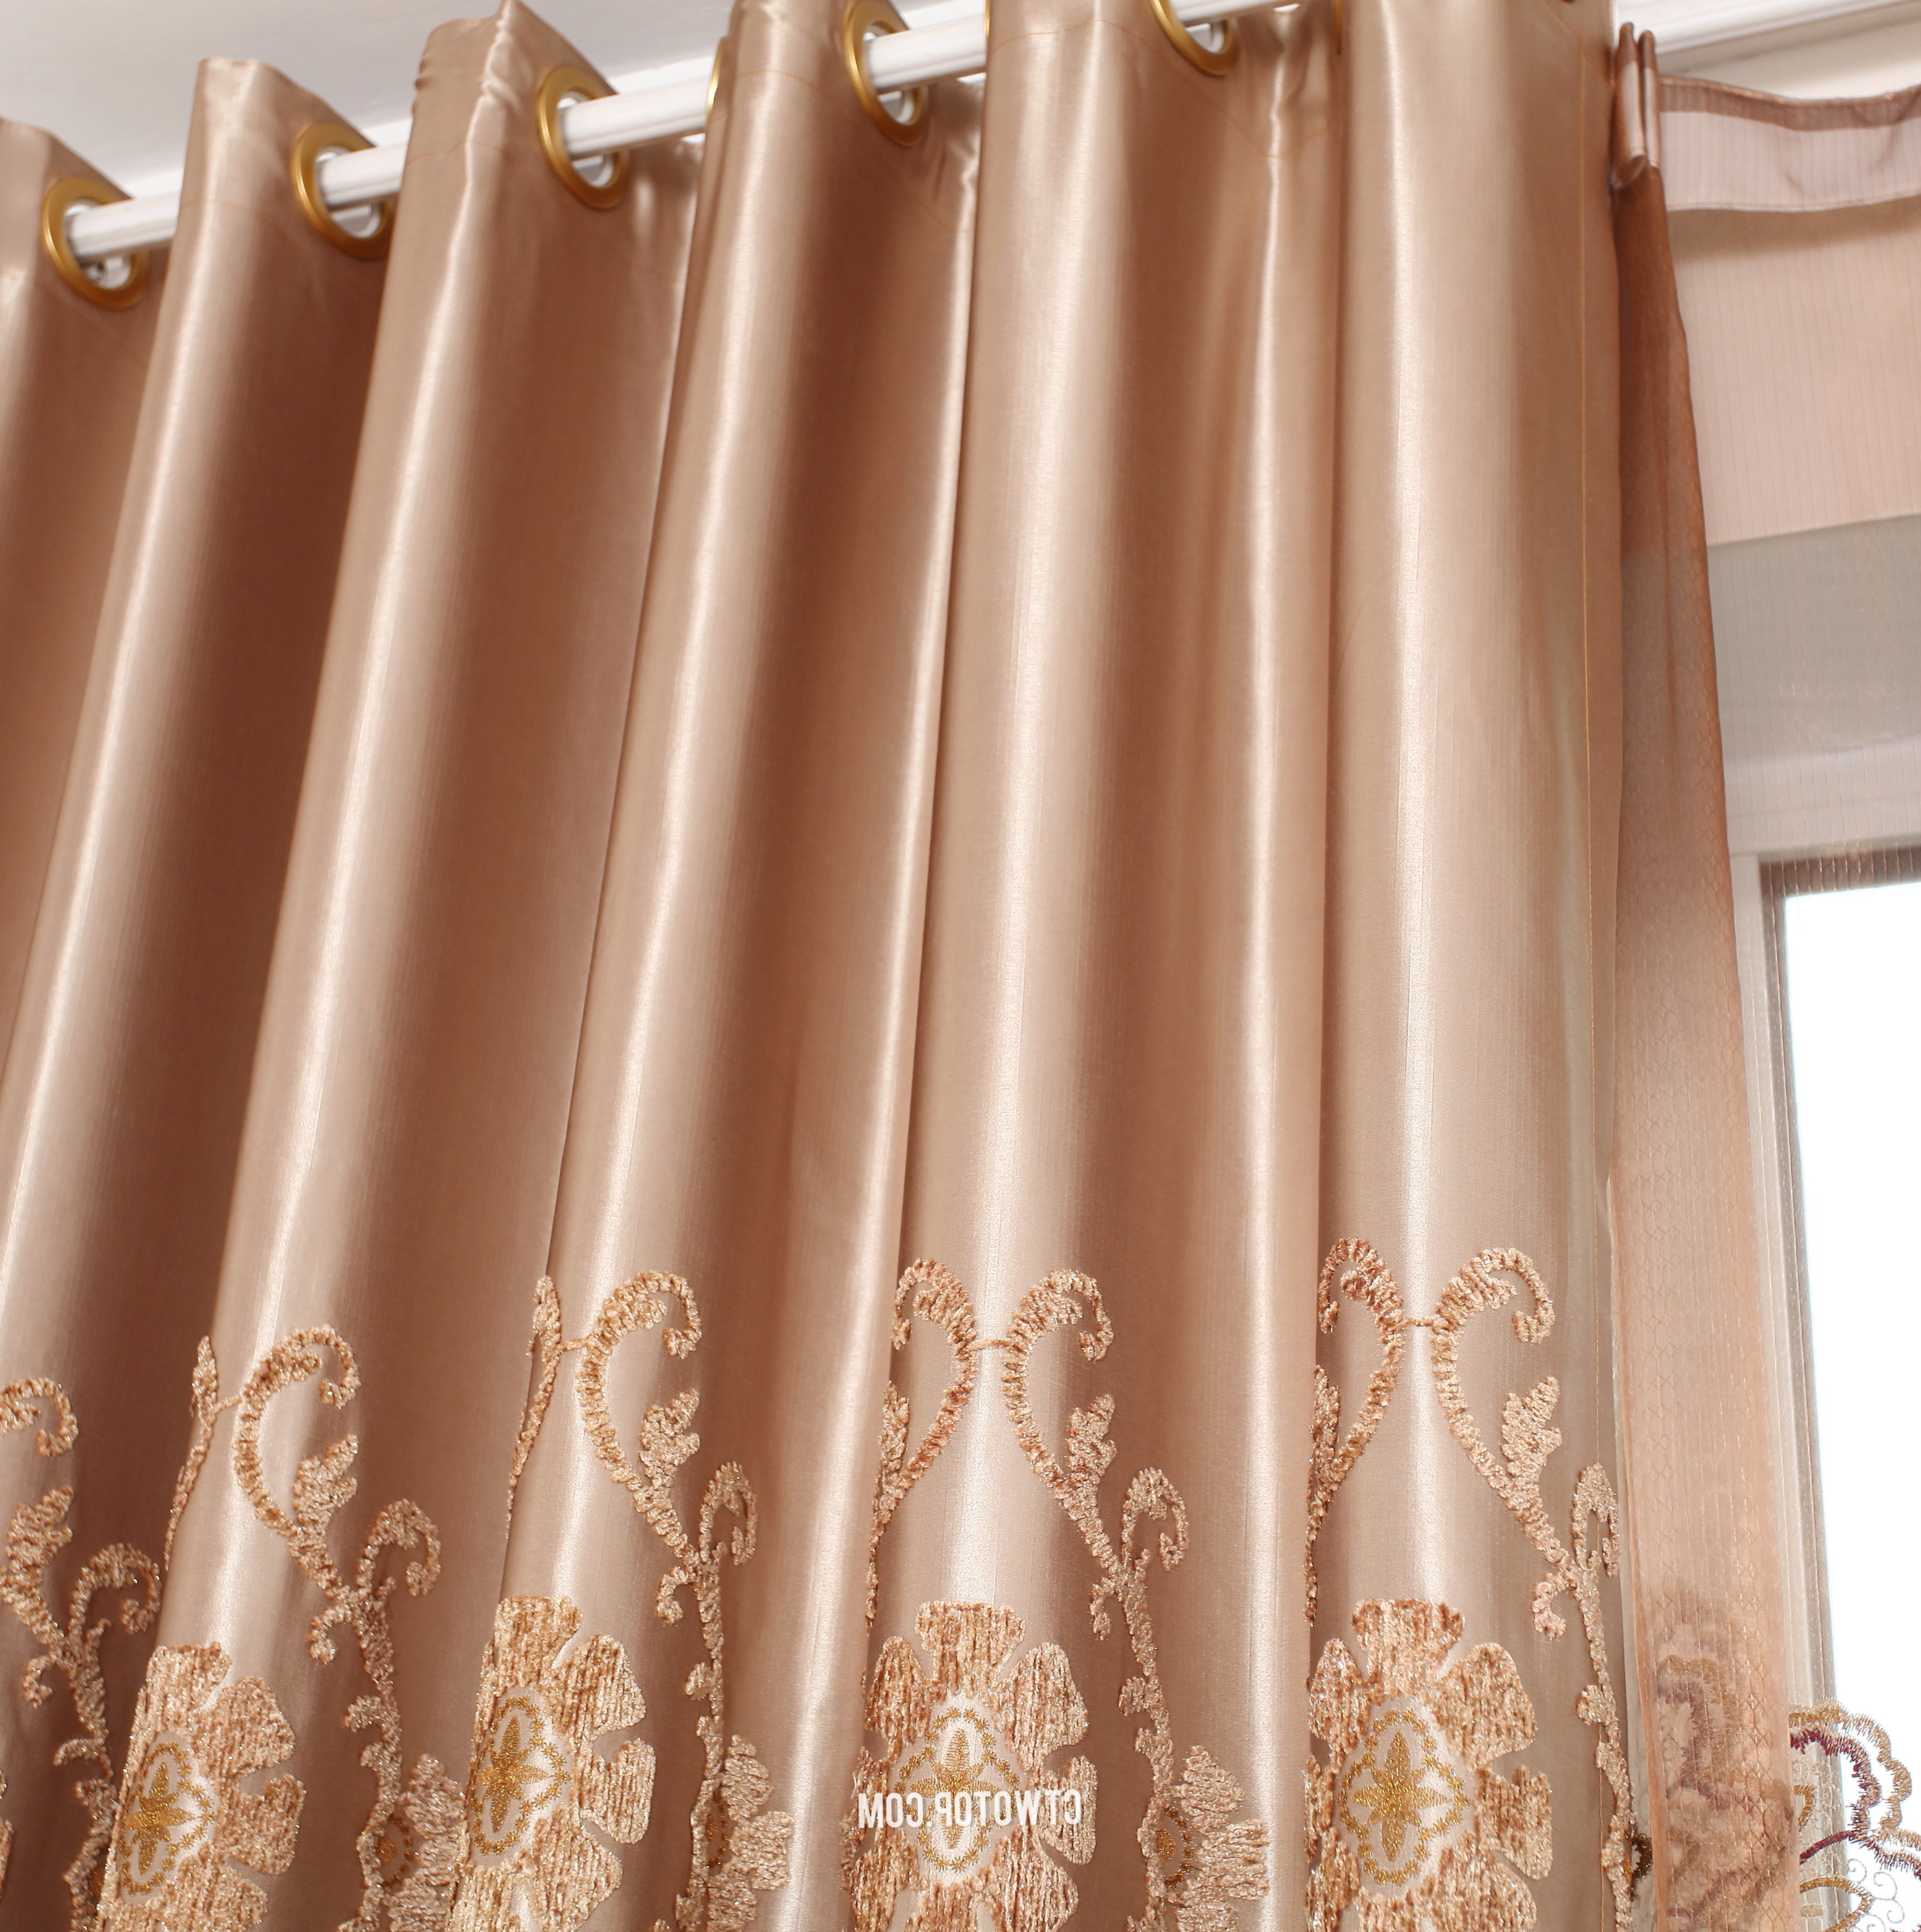 Sound Dampening Curtains Amazon